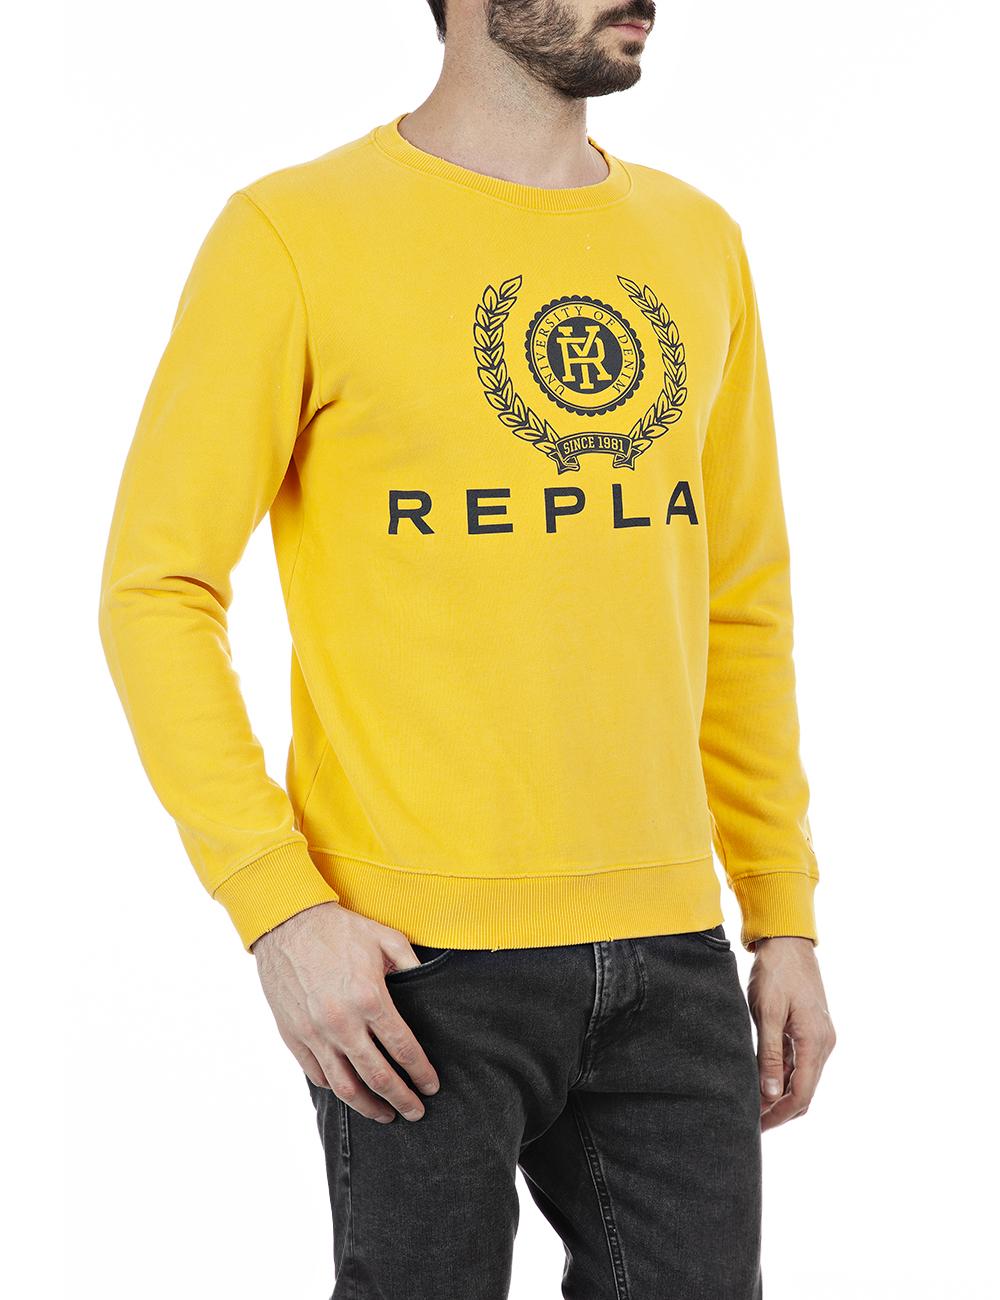 REPLAY   Yellow peach hand cotton fleece Sweatshirt